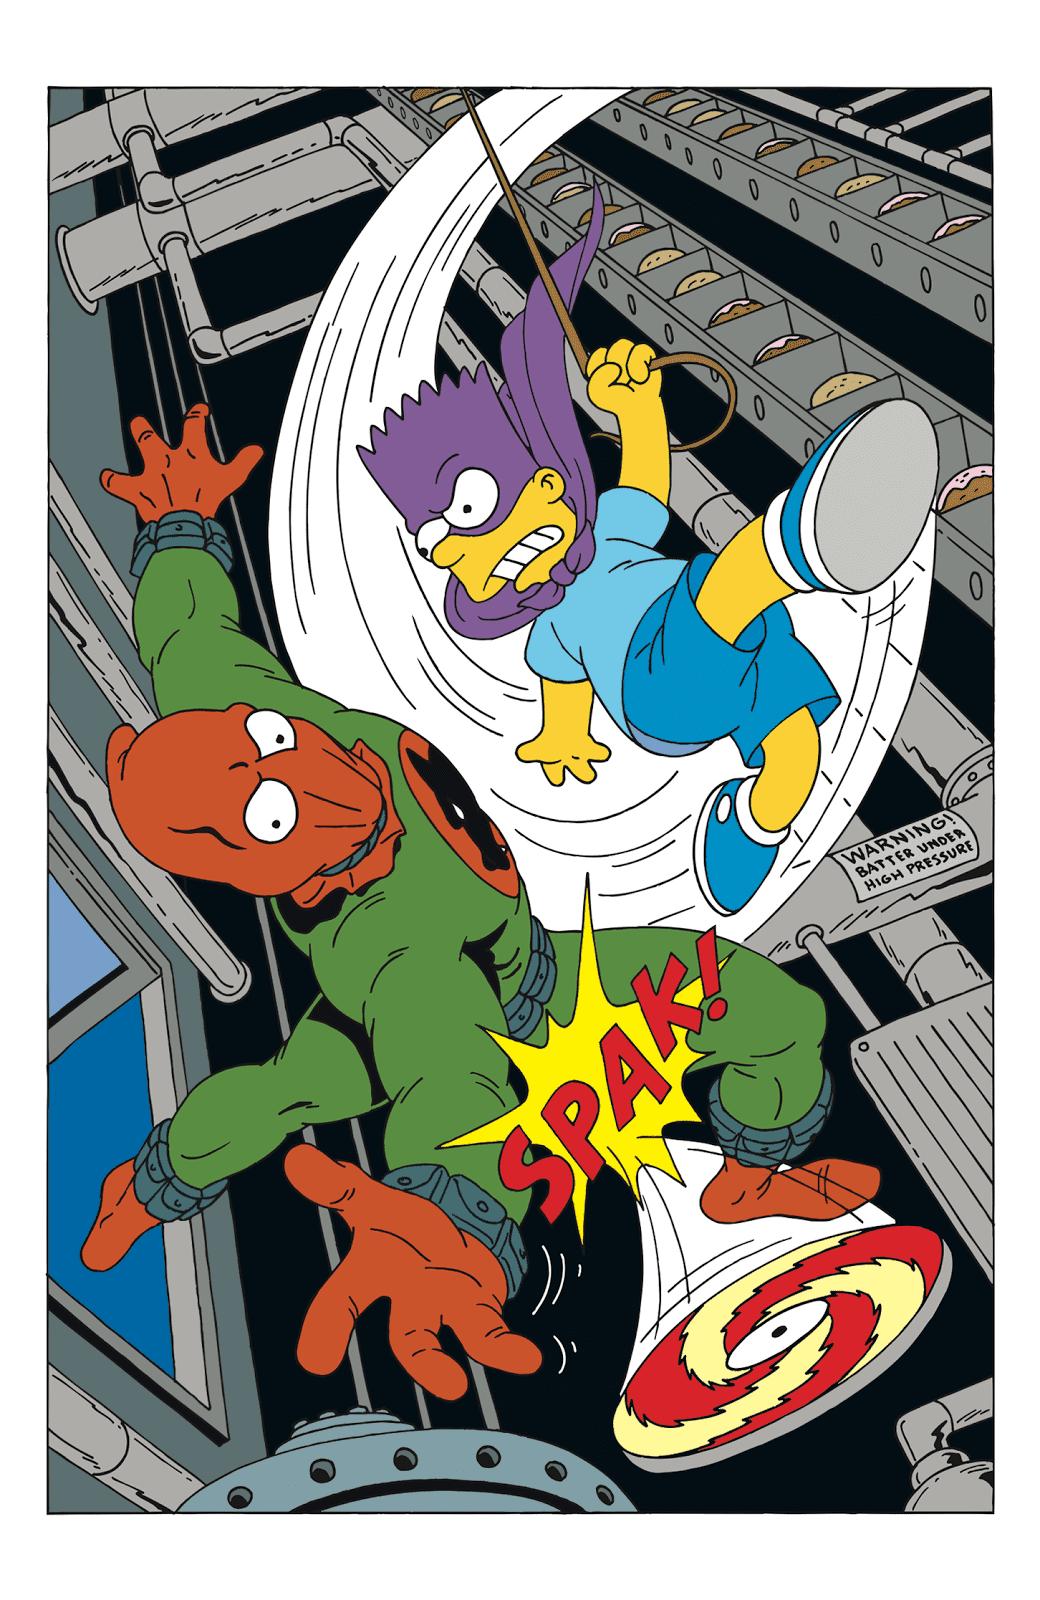 Read online Bartman comic -  Issue #2 - 20